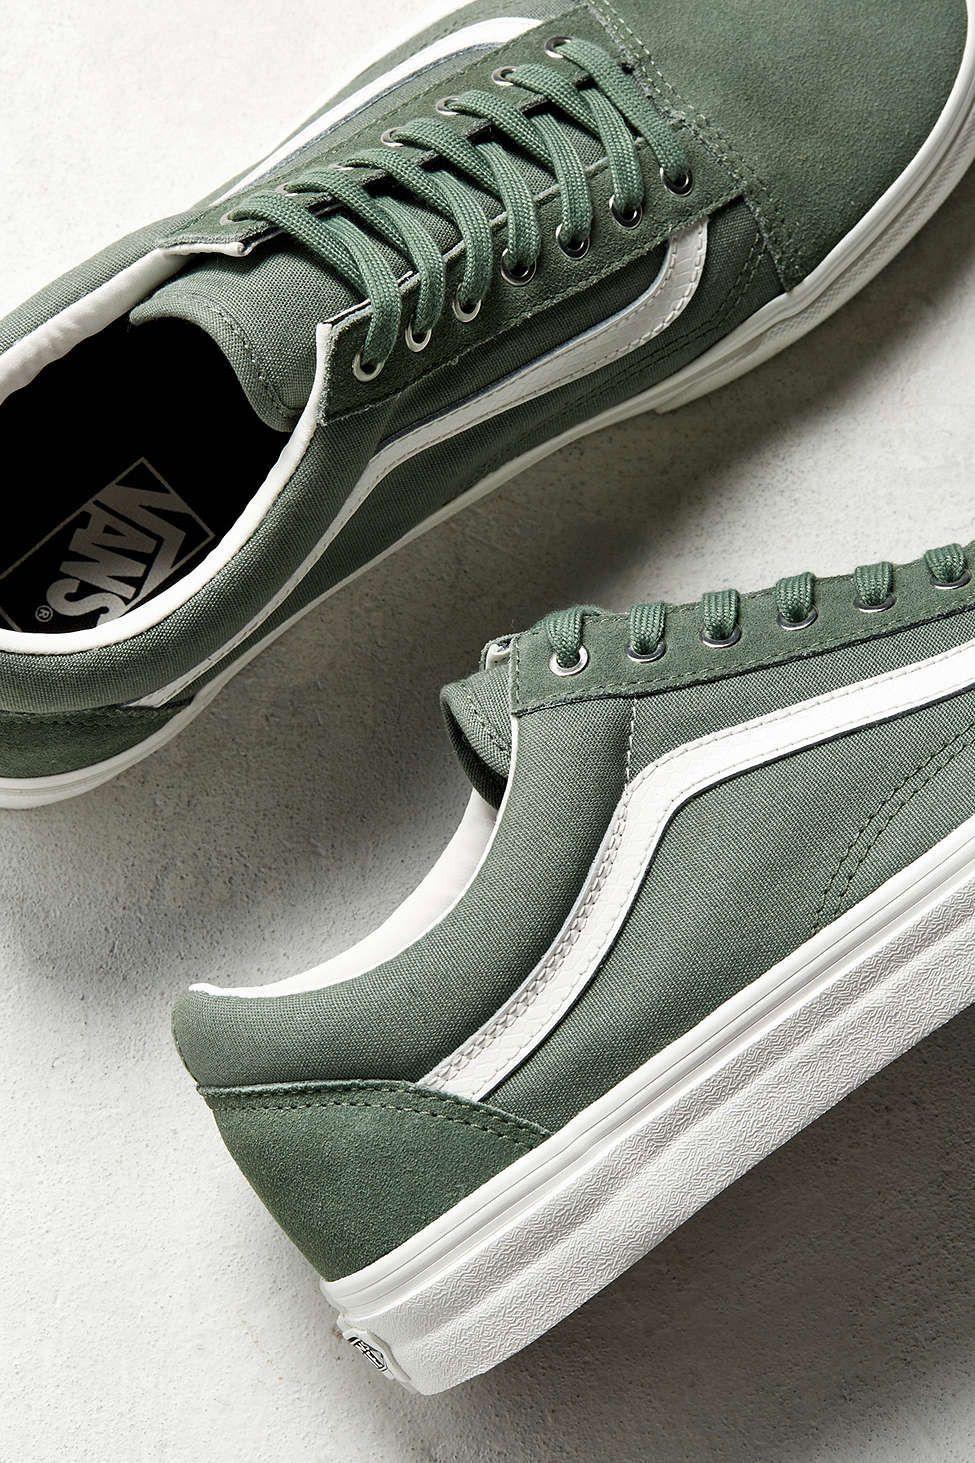 UNSTABLE UNSTABLE UNSTABLE FRAGMENTS sapatos Pinterest Vans Clothes and Footwear 2ec9a2